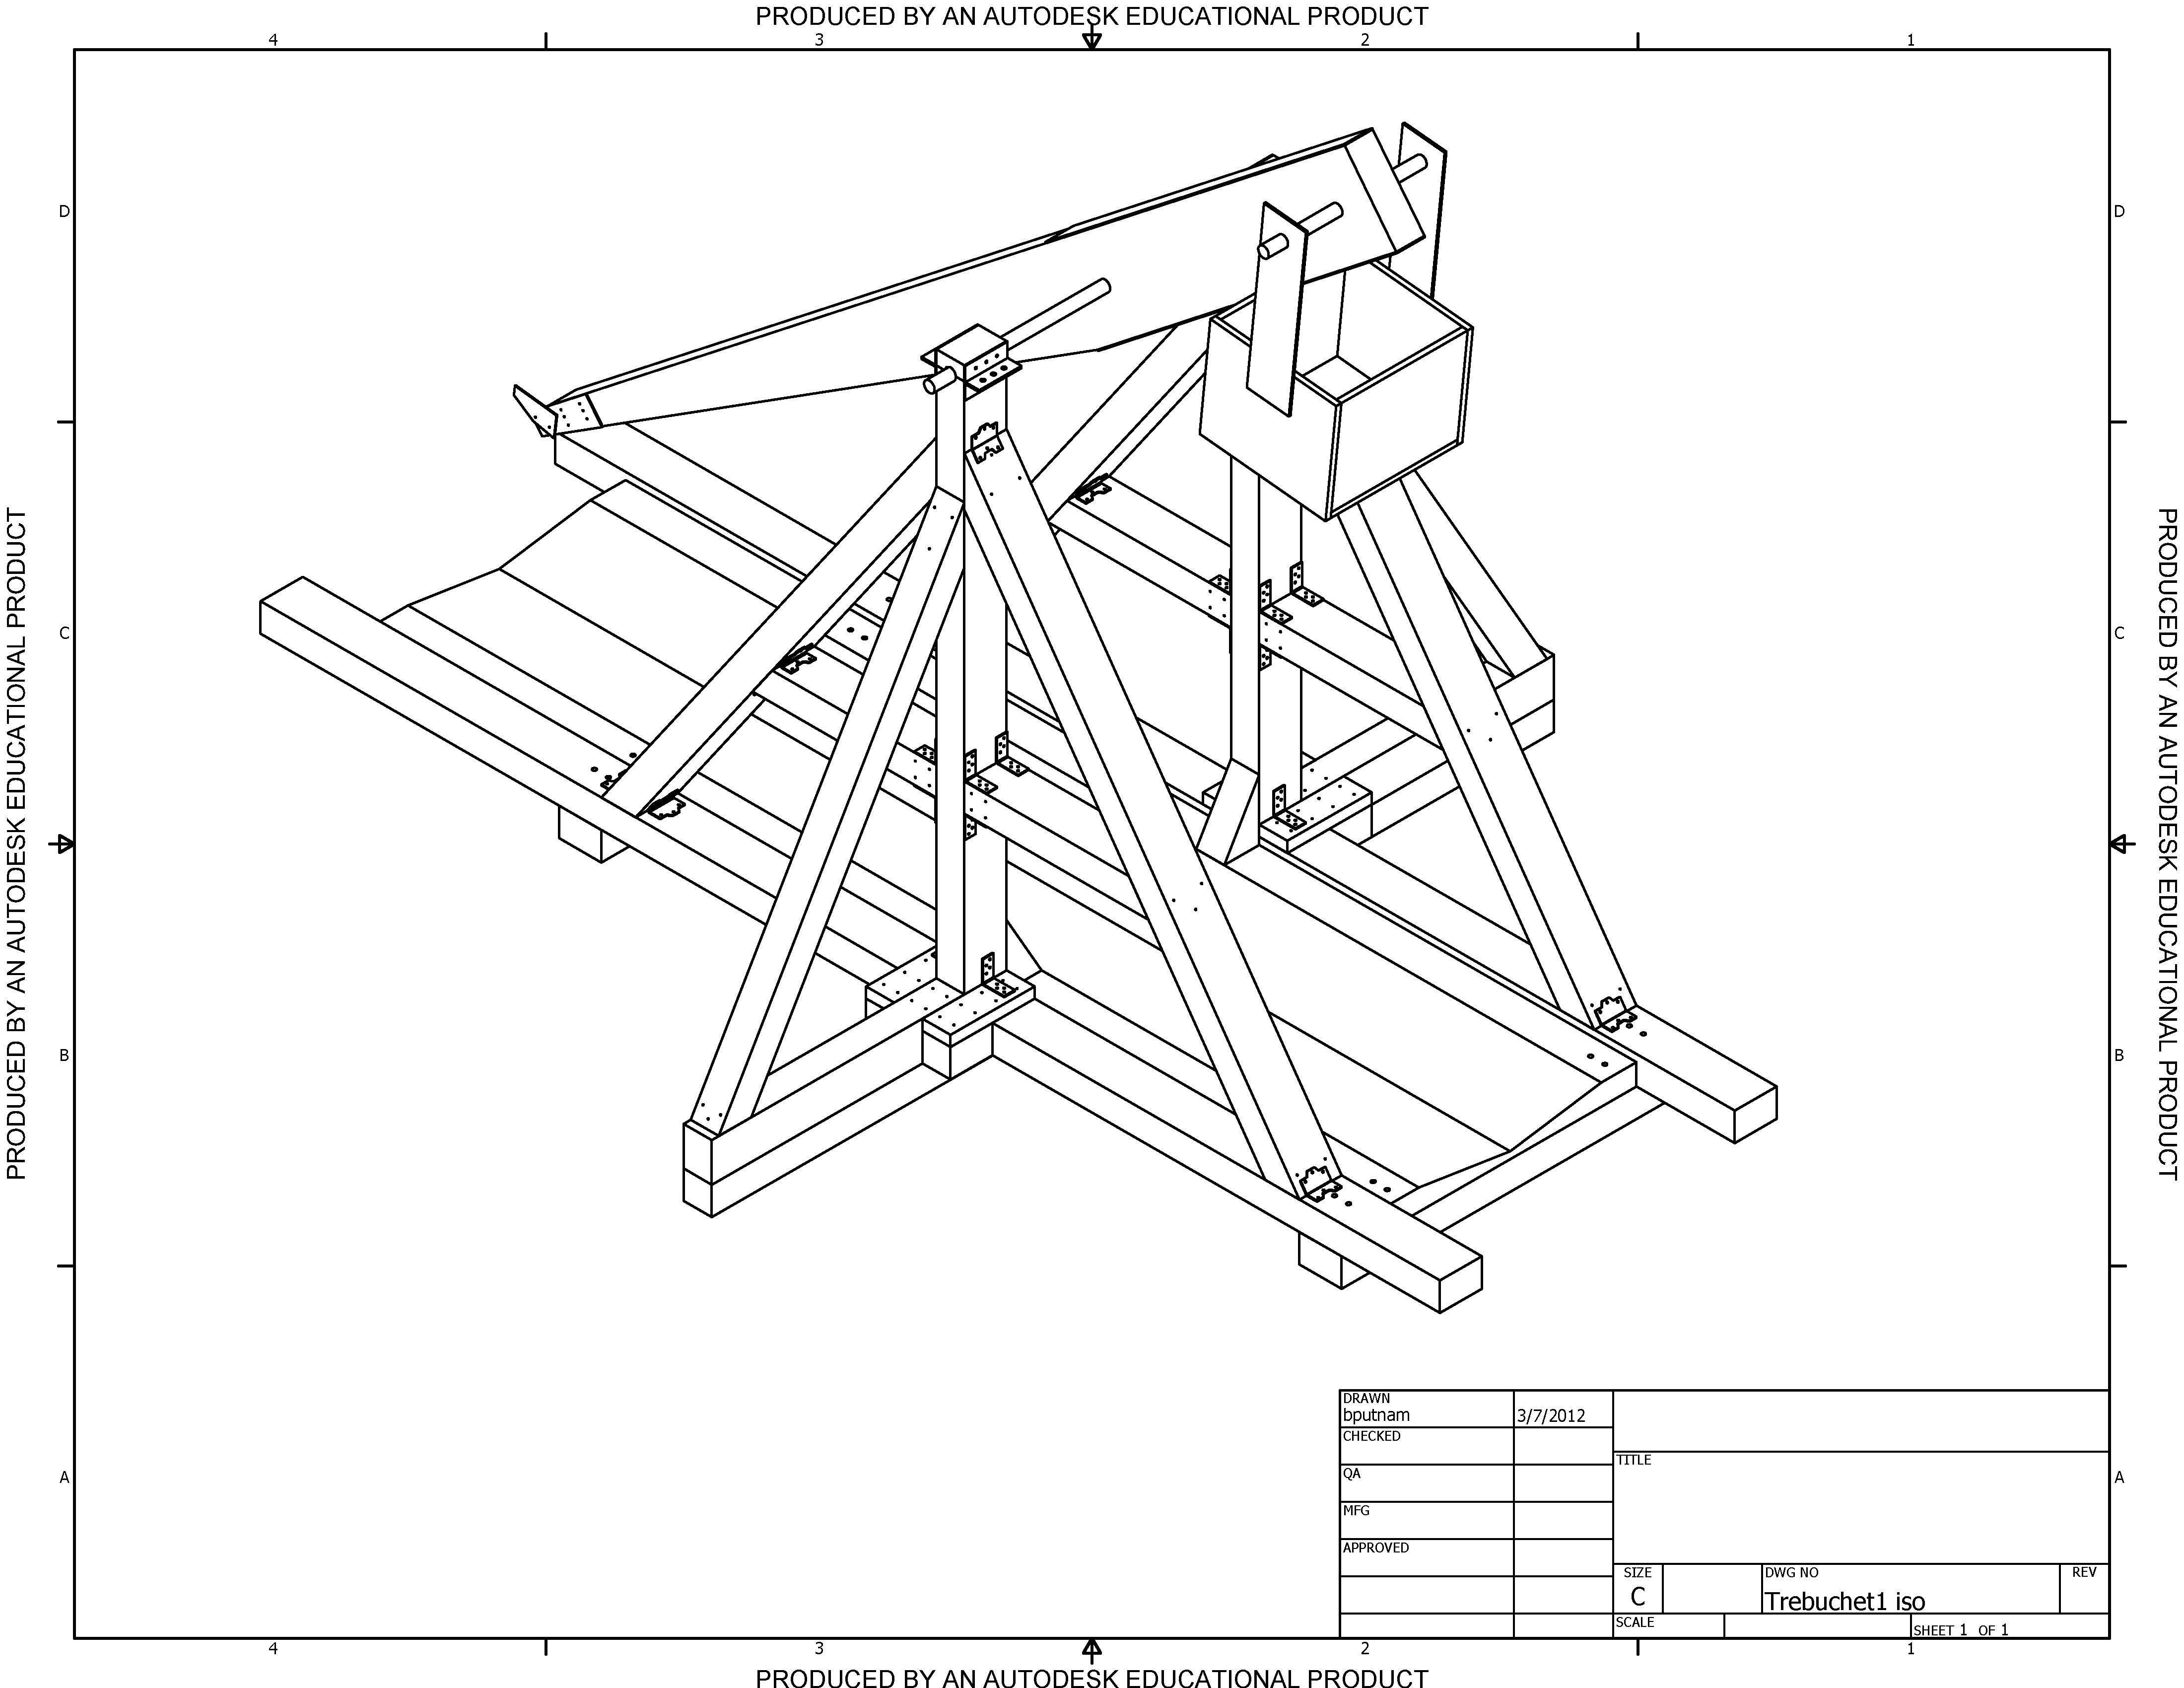 design and analysis trebuchet cnc plans wooden model kits diy kits